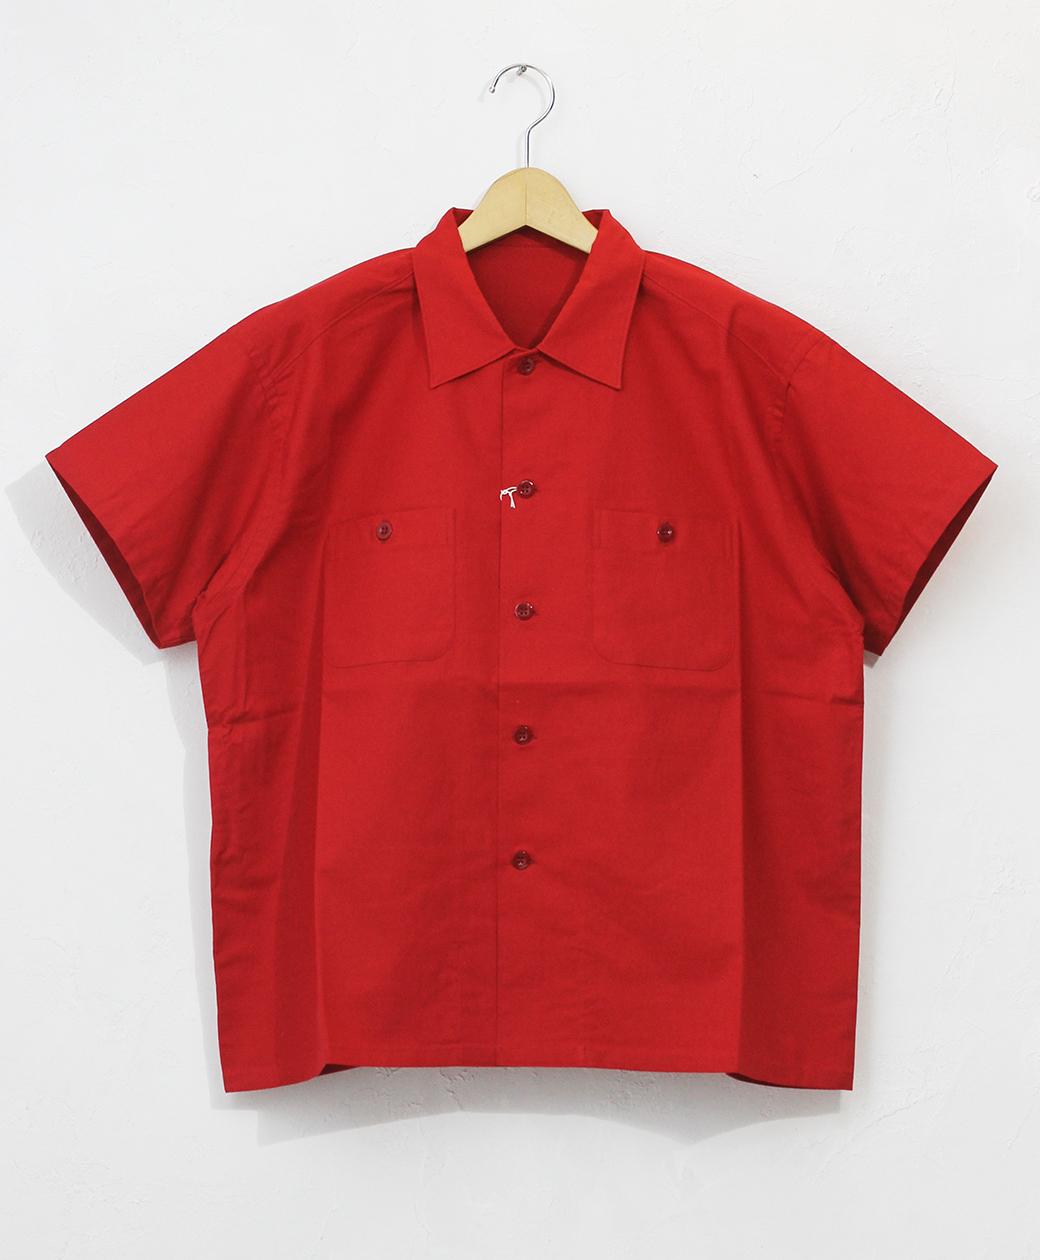 TUKI blouses(red)